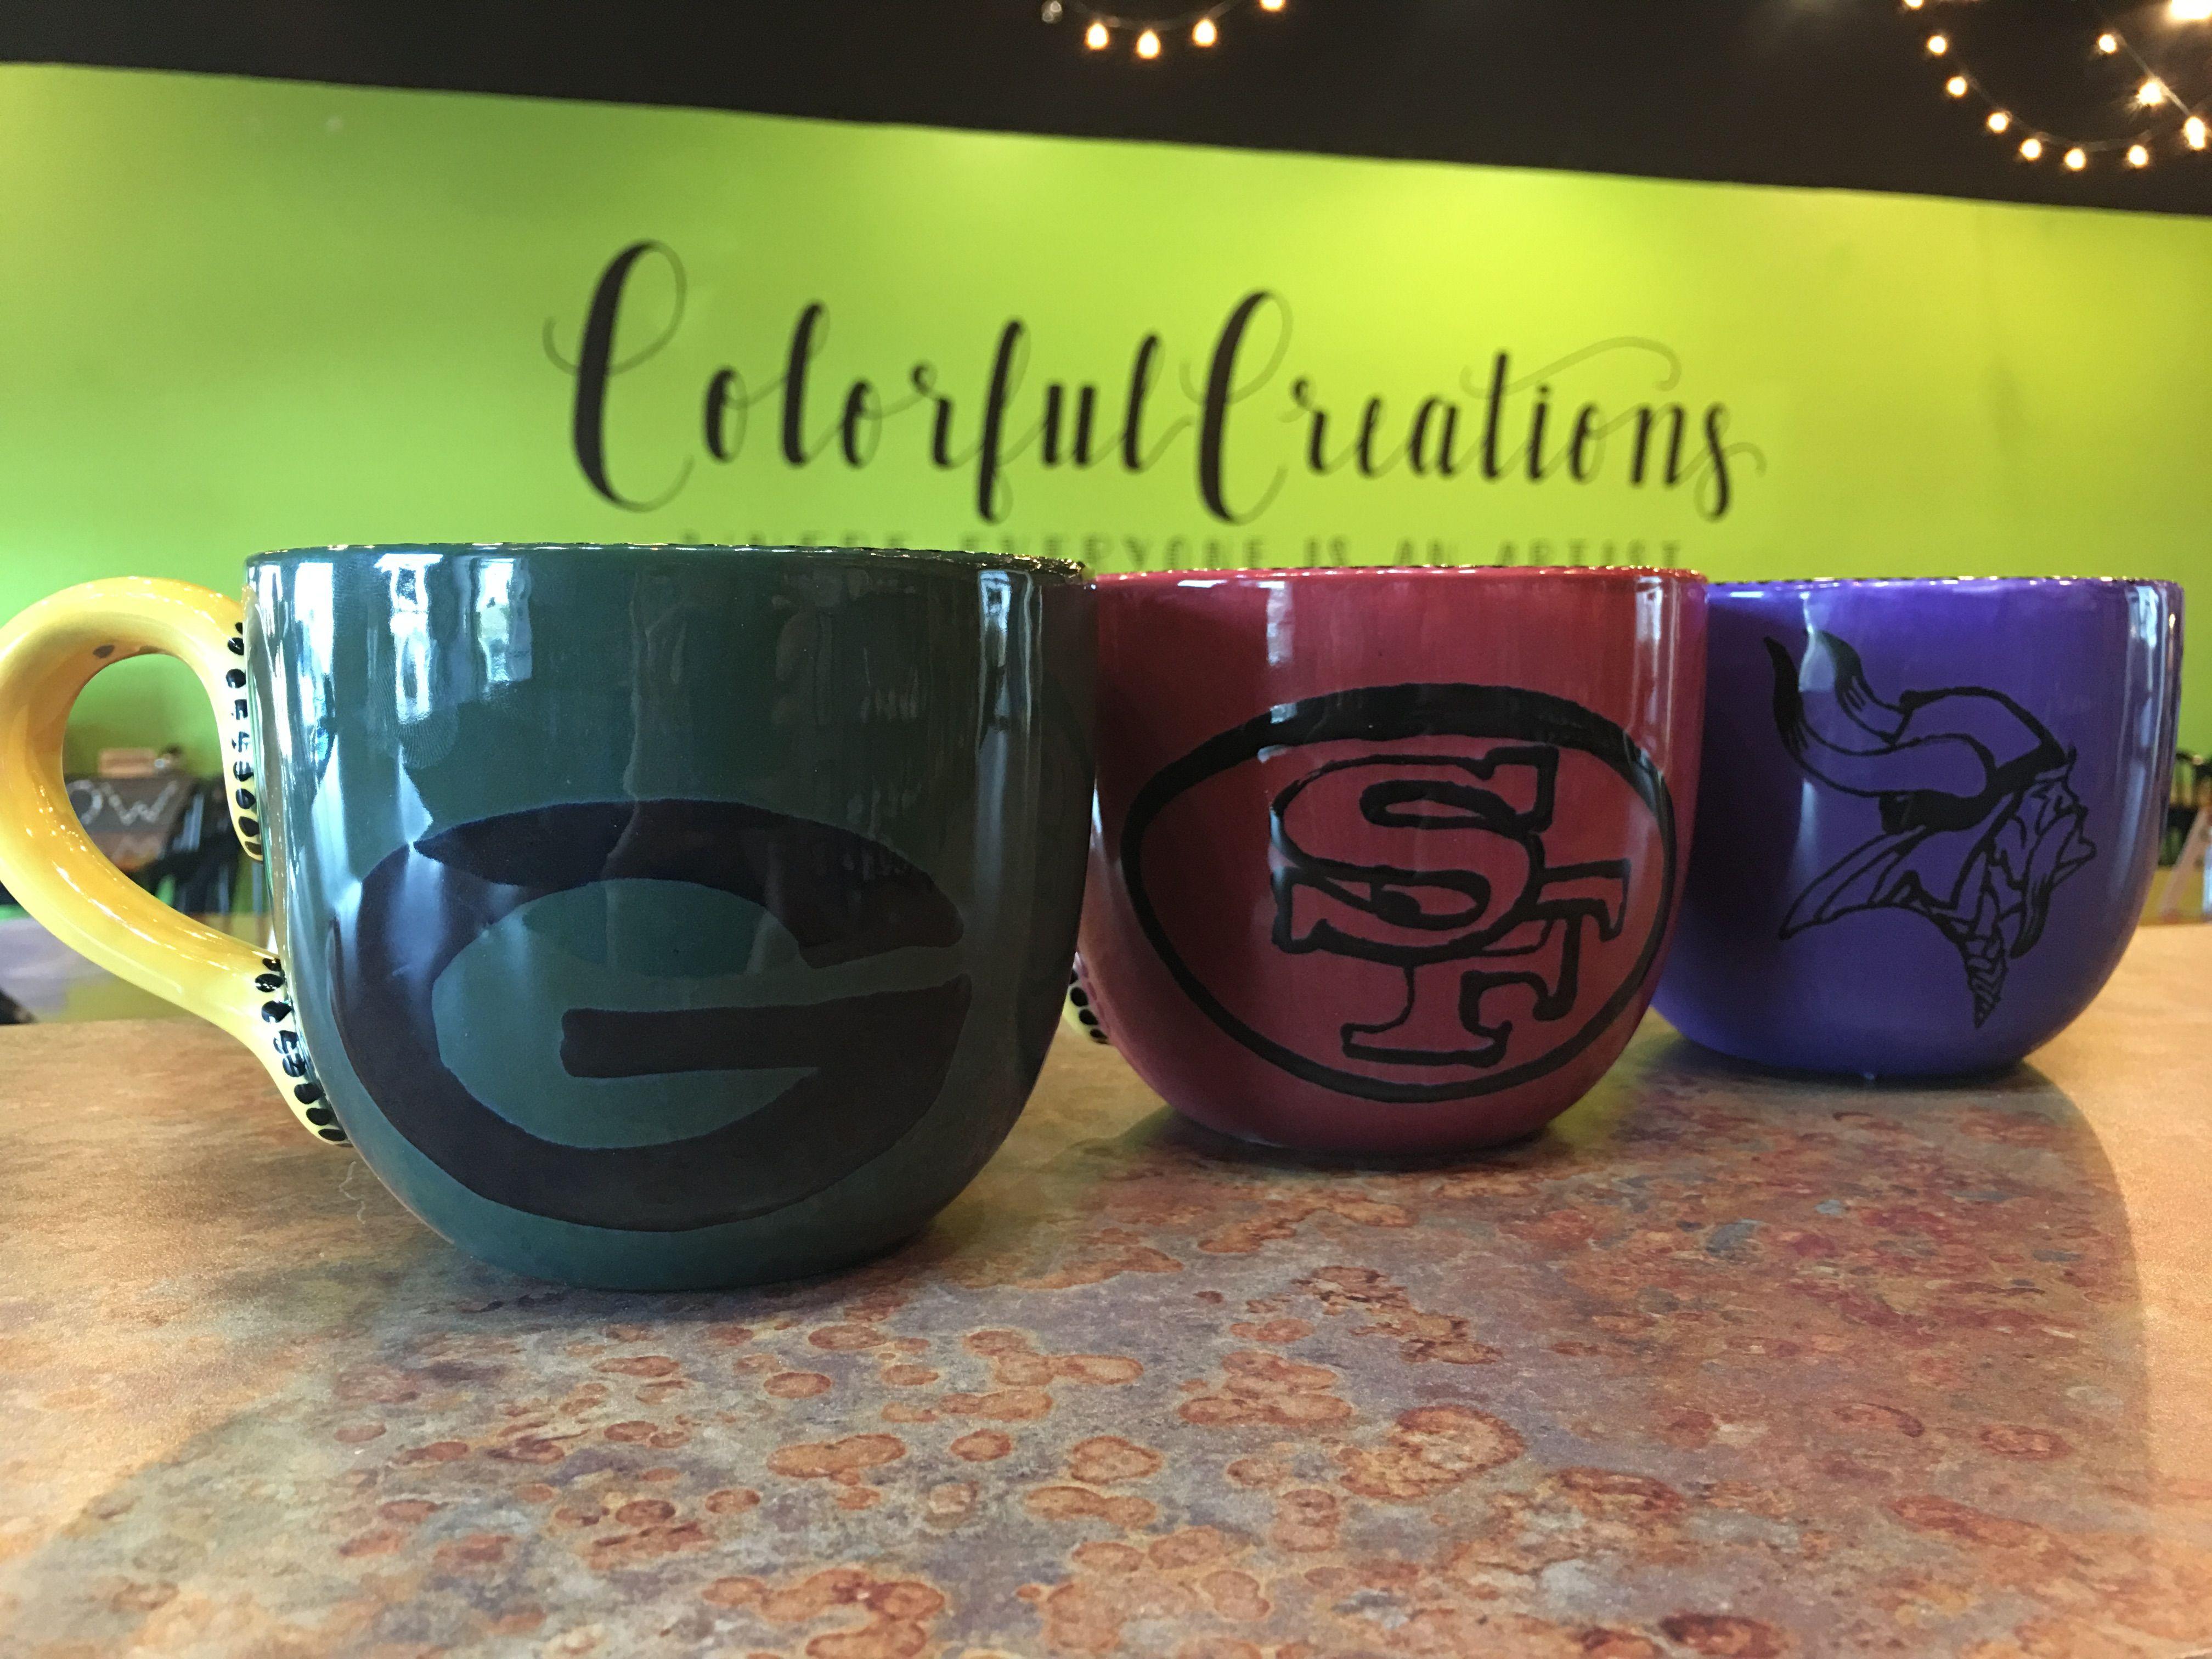 Football Mugs Green Bay Packers Mug San Francisco 49ers Mug Minnesota Vikings Mug Ceramics Painted Pottery Mug Tr Pottery Painting Handmade Paint Pottery